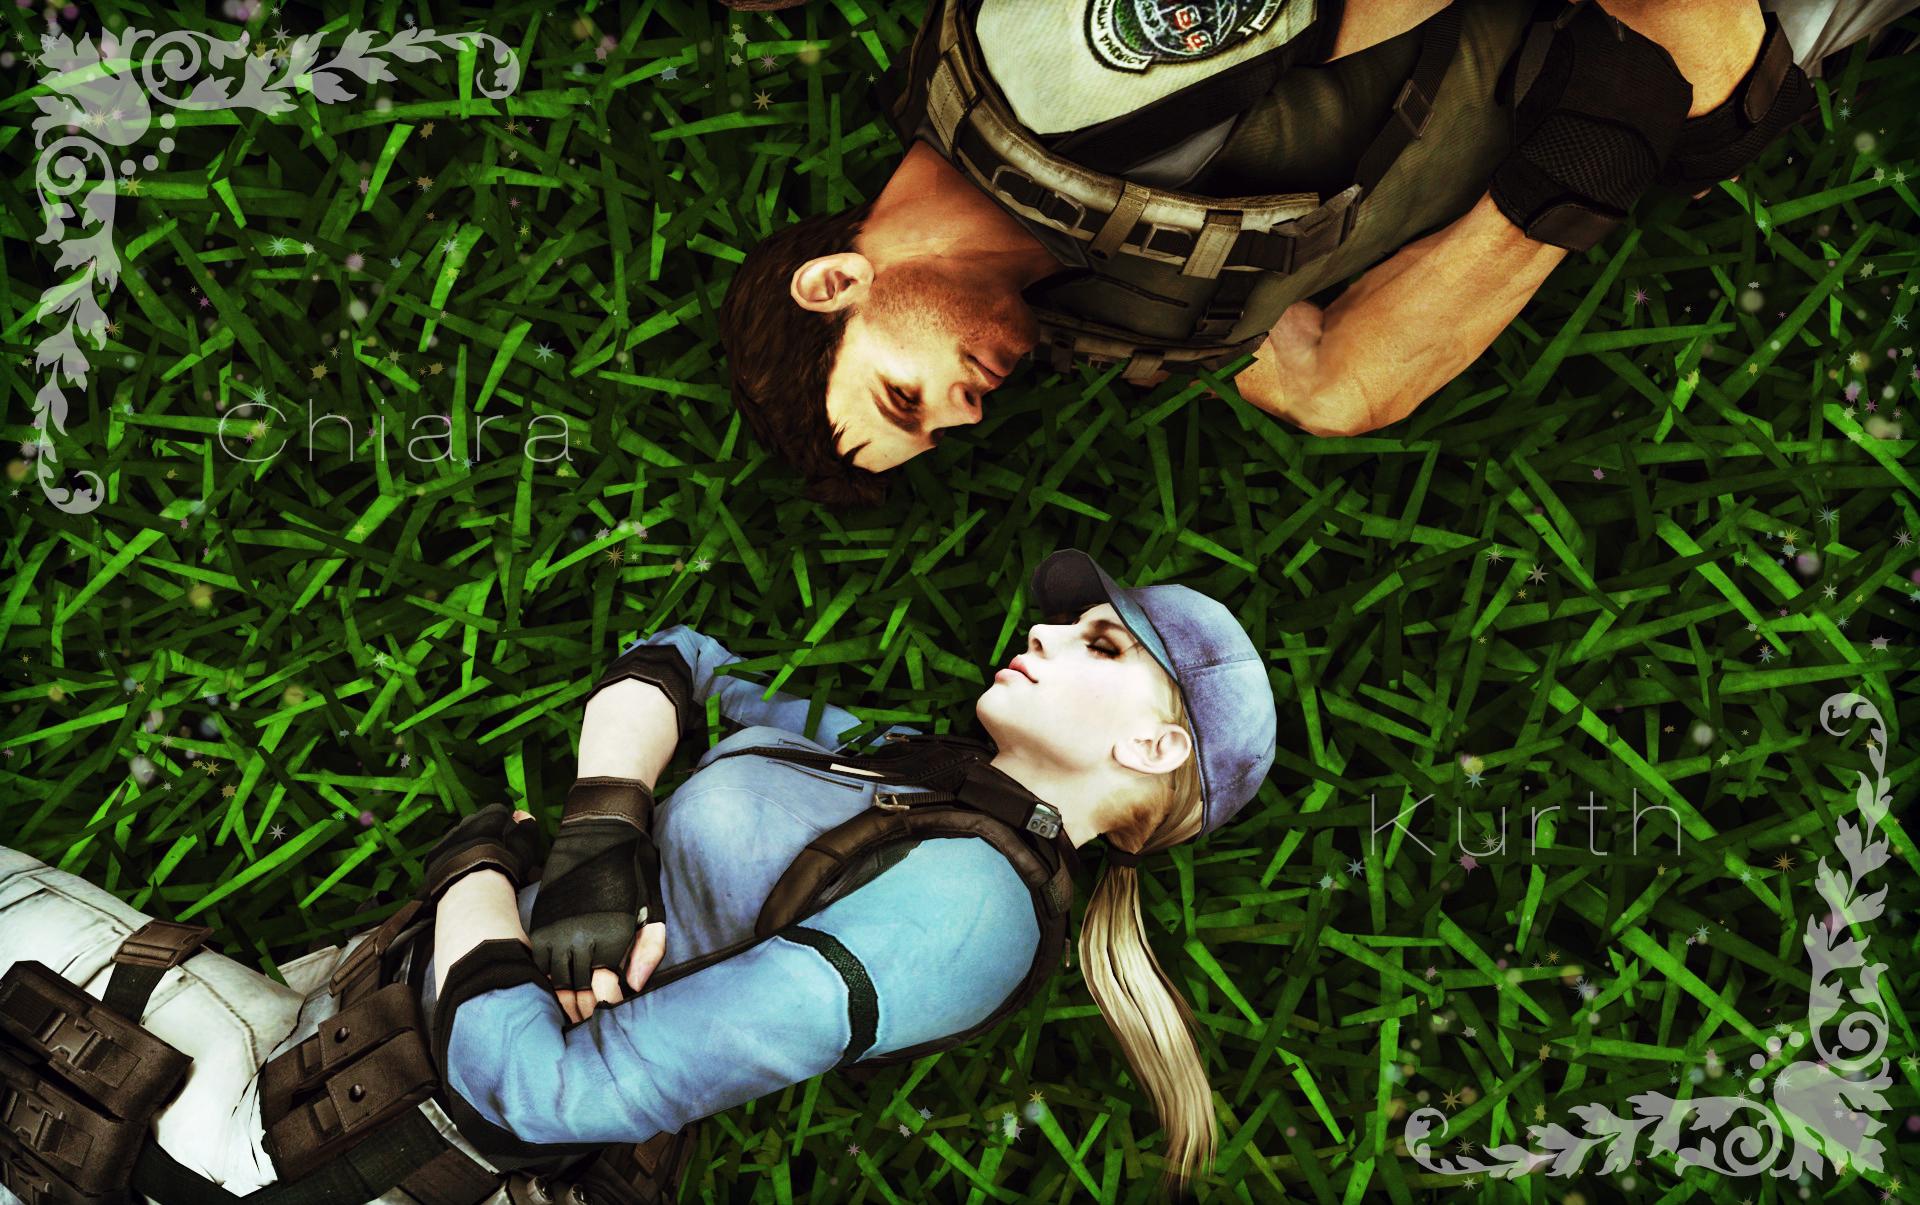 Jill Valentine And Chris Redfield 6 By Mk-re55 On DeviantArt